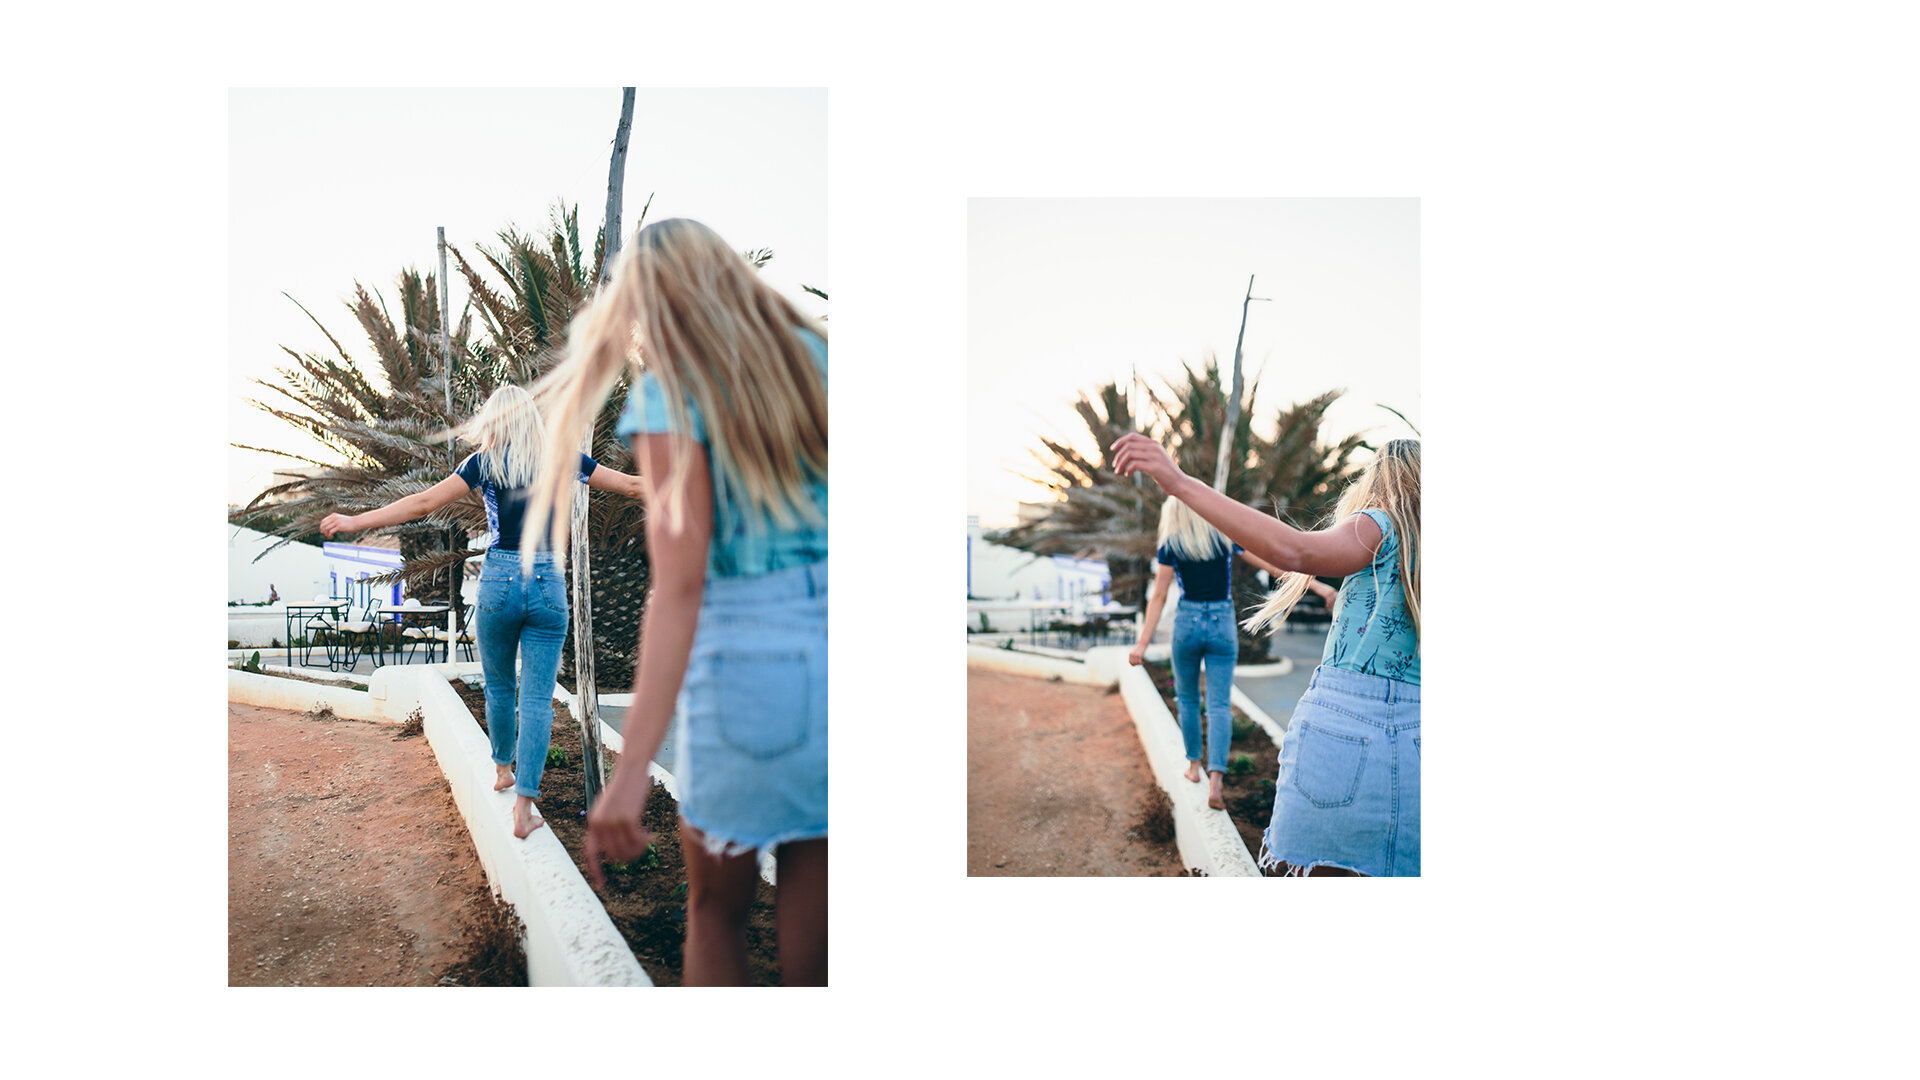 toby-butler-tobybutlerphoto-surf-surfing-waterphotography-ocean-Oneill-wetsuits-swimwear-girl-bikini-clothing-surf-portugal-lifestylephotography-4.jpg